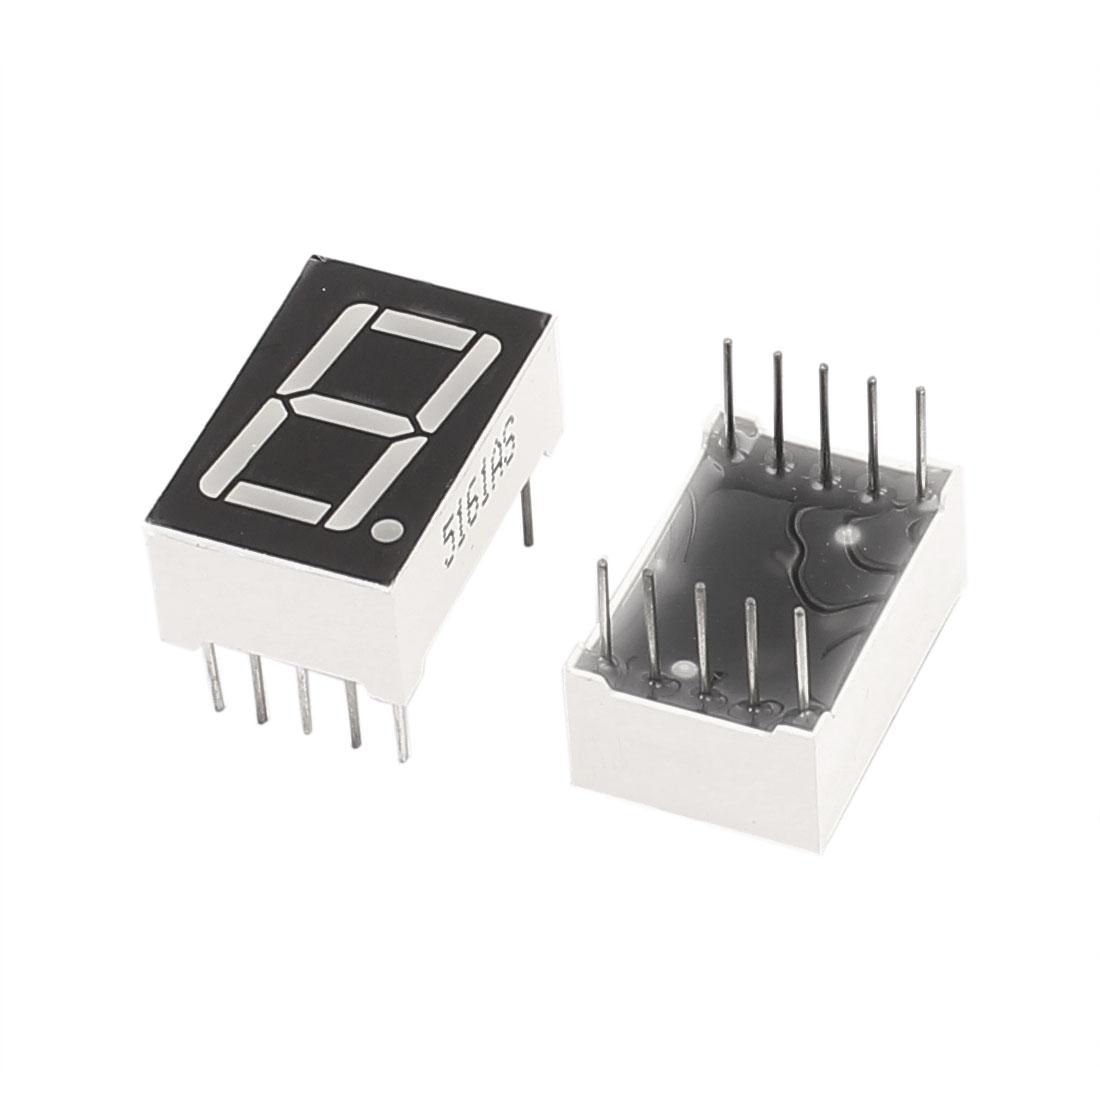 "2 Pcs Common Cathode 10 Pin 1 Bit 7 Segment 0.56"" Red LED Display Digital Tube"